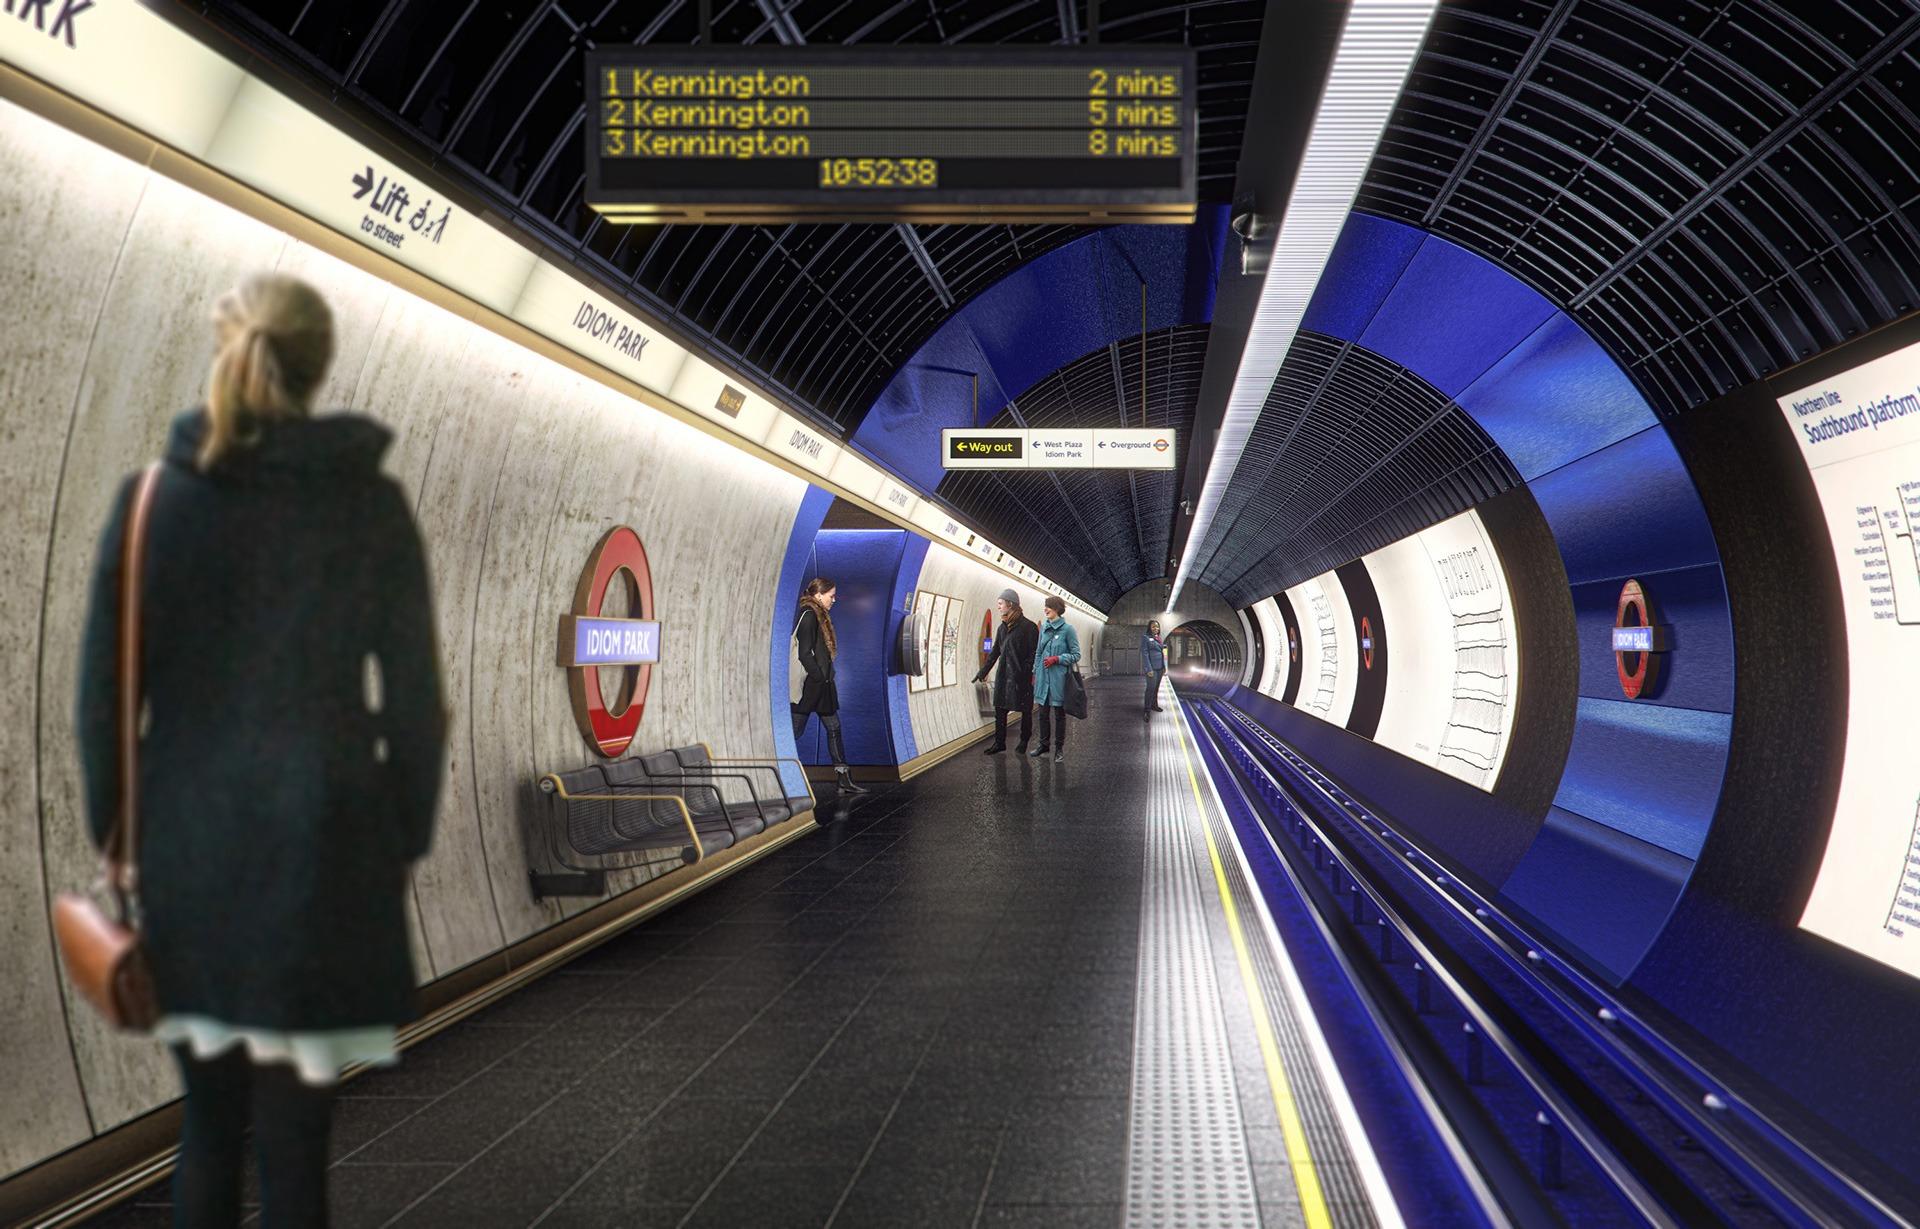 stas3dart-london-underground-ava-architecture-studio-egret-west-promotional-image-modelling-gallery3